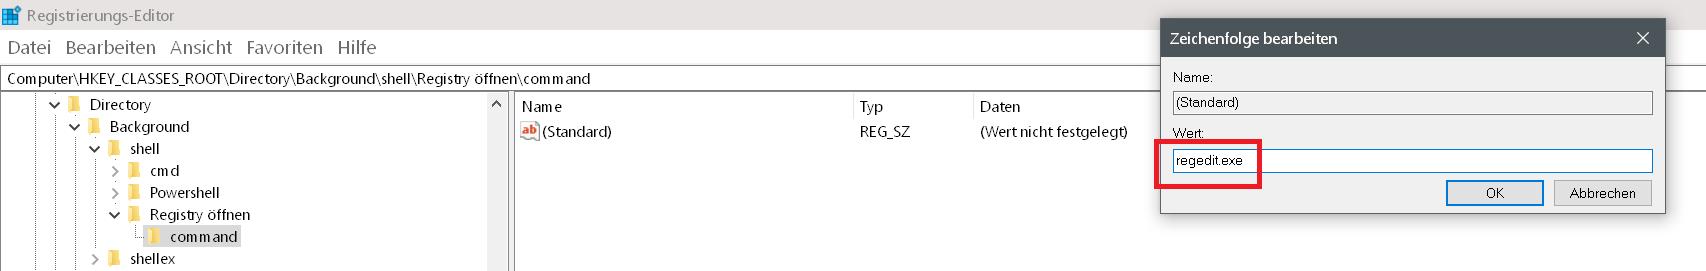 Windows 10 Rechtsklick Kontextmenü erweitern 9